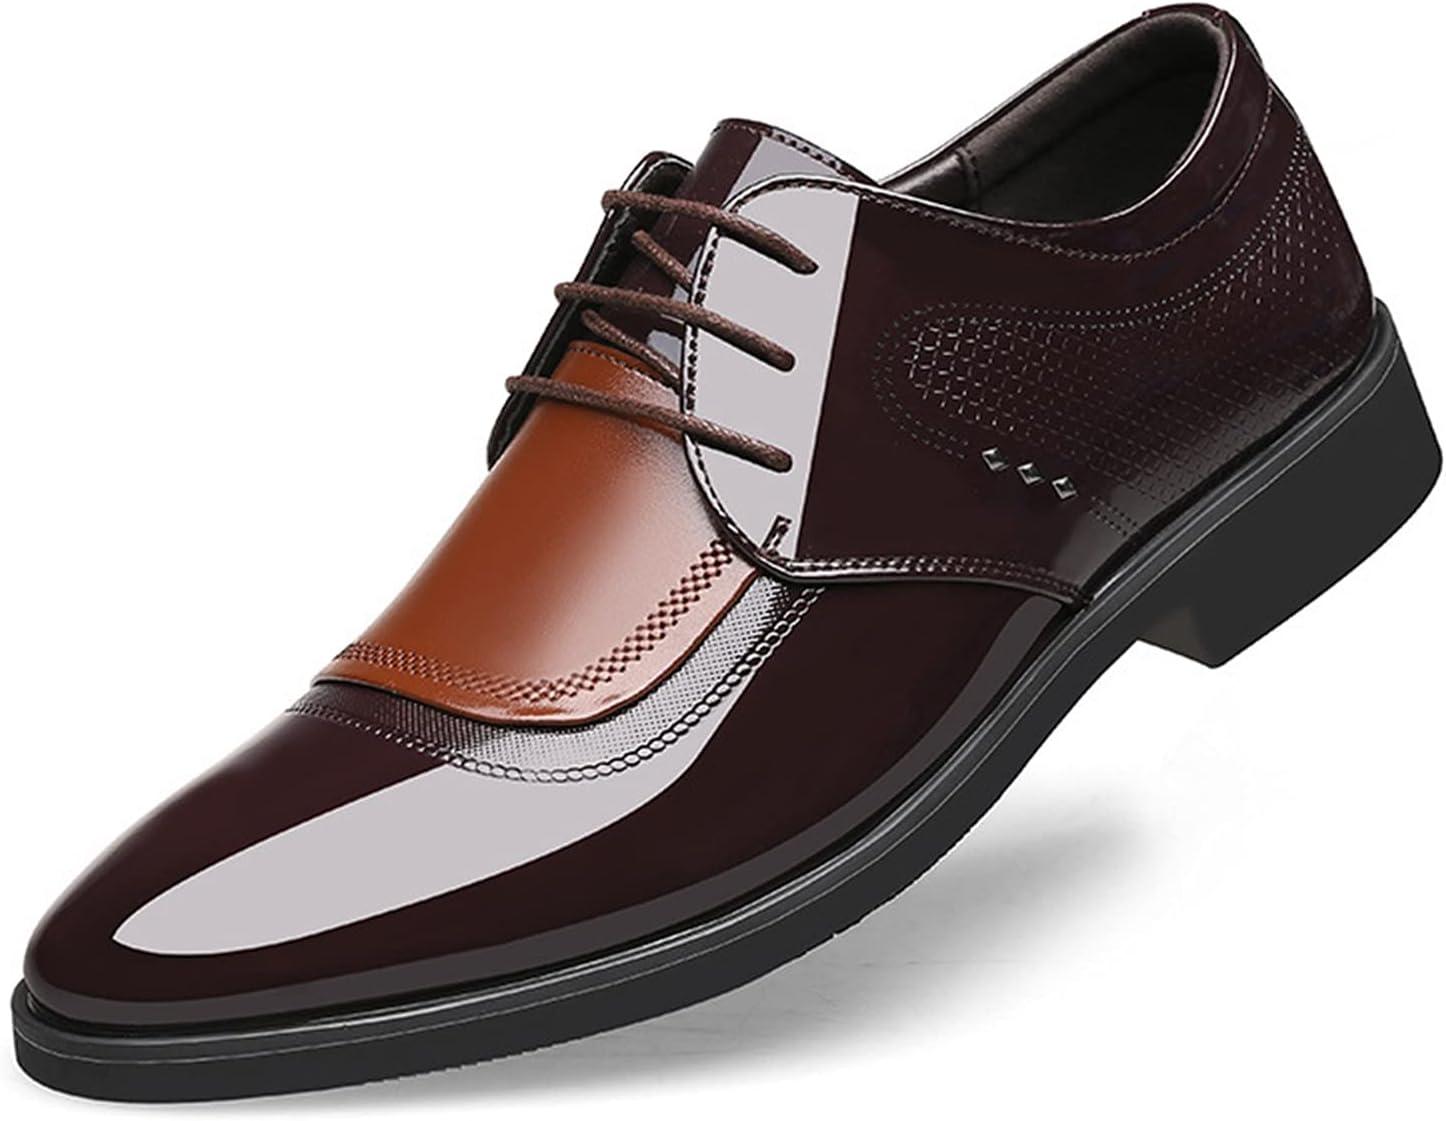 Men's Vegan Leather Oxfords Wingtips Pull Tap Lace Up Cap Toe Shoe Slip Resistant Formal (Color : Brown, Size : 44 EU)